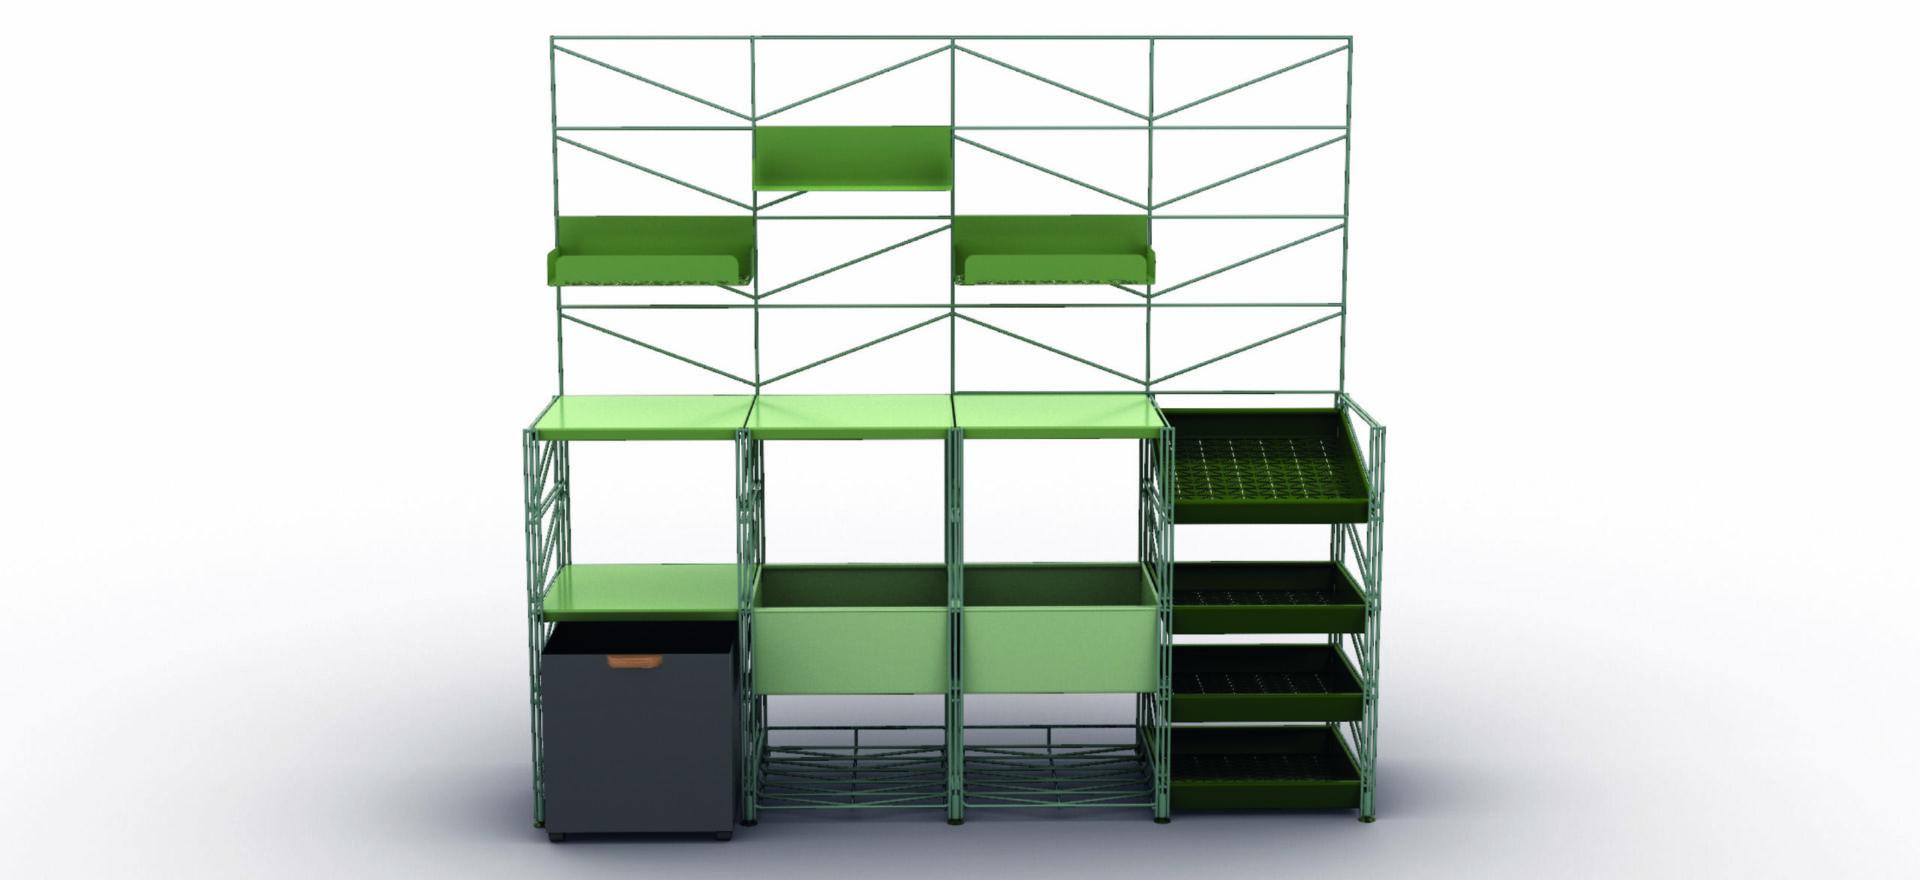 Socrate Outdoor_Outdoor Furniture_Green_Caimi_Mario Trimarchi Design